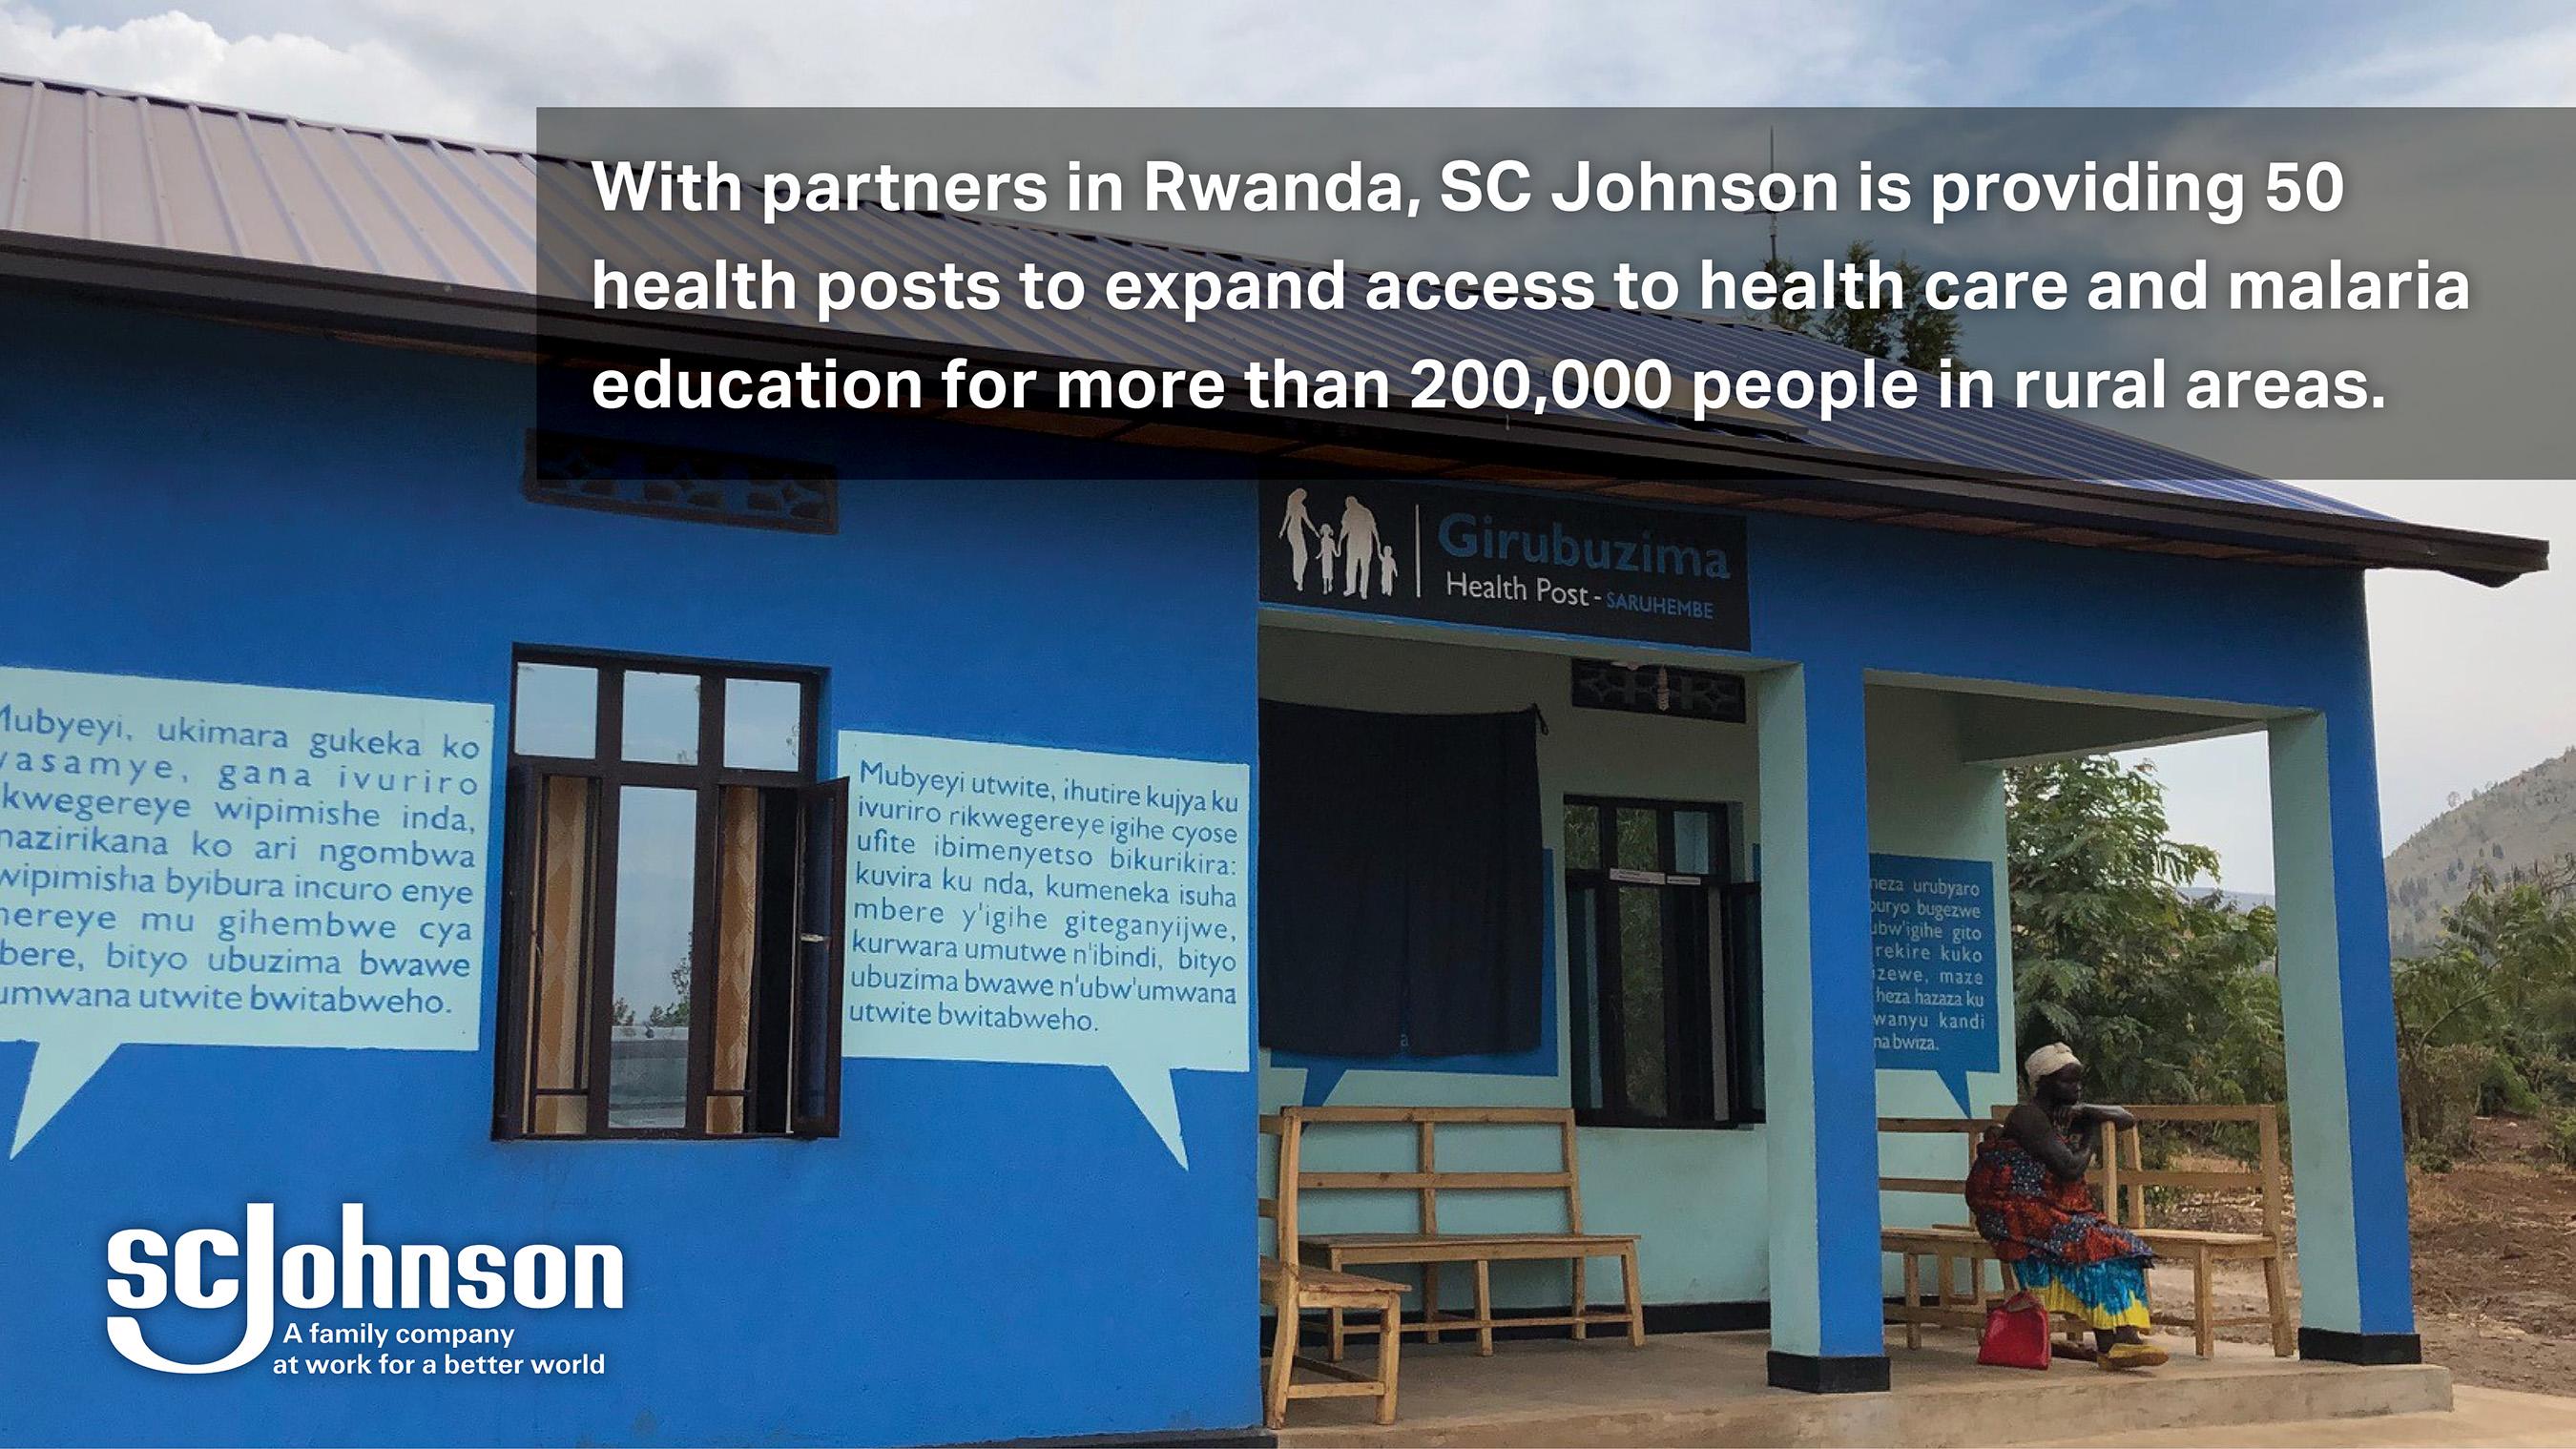 An SC Johnson sponsored health post in Rwanda.